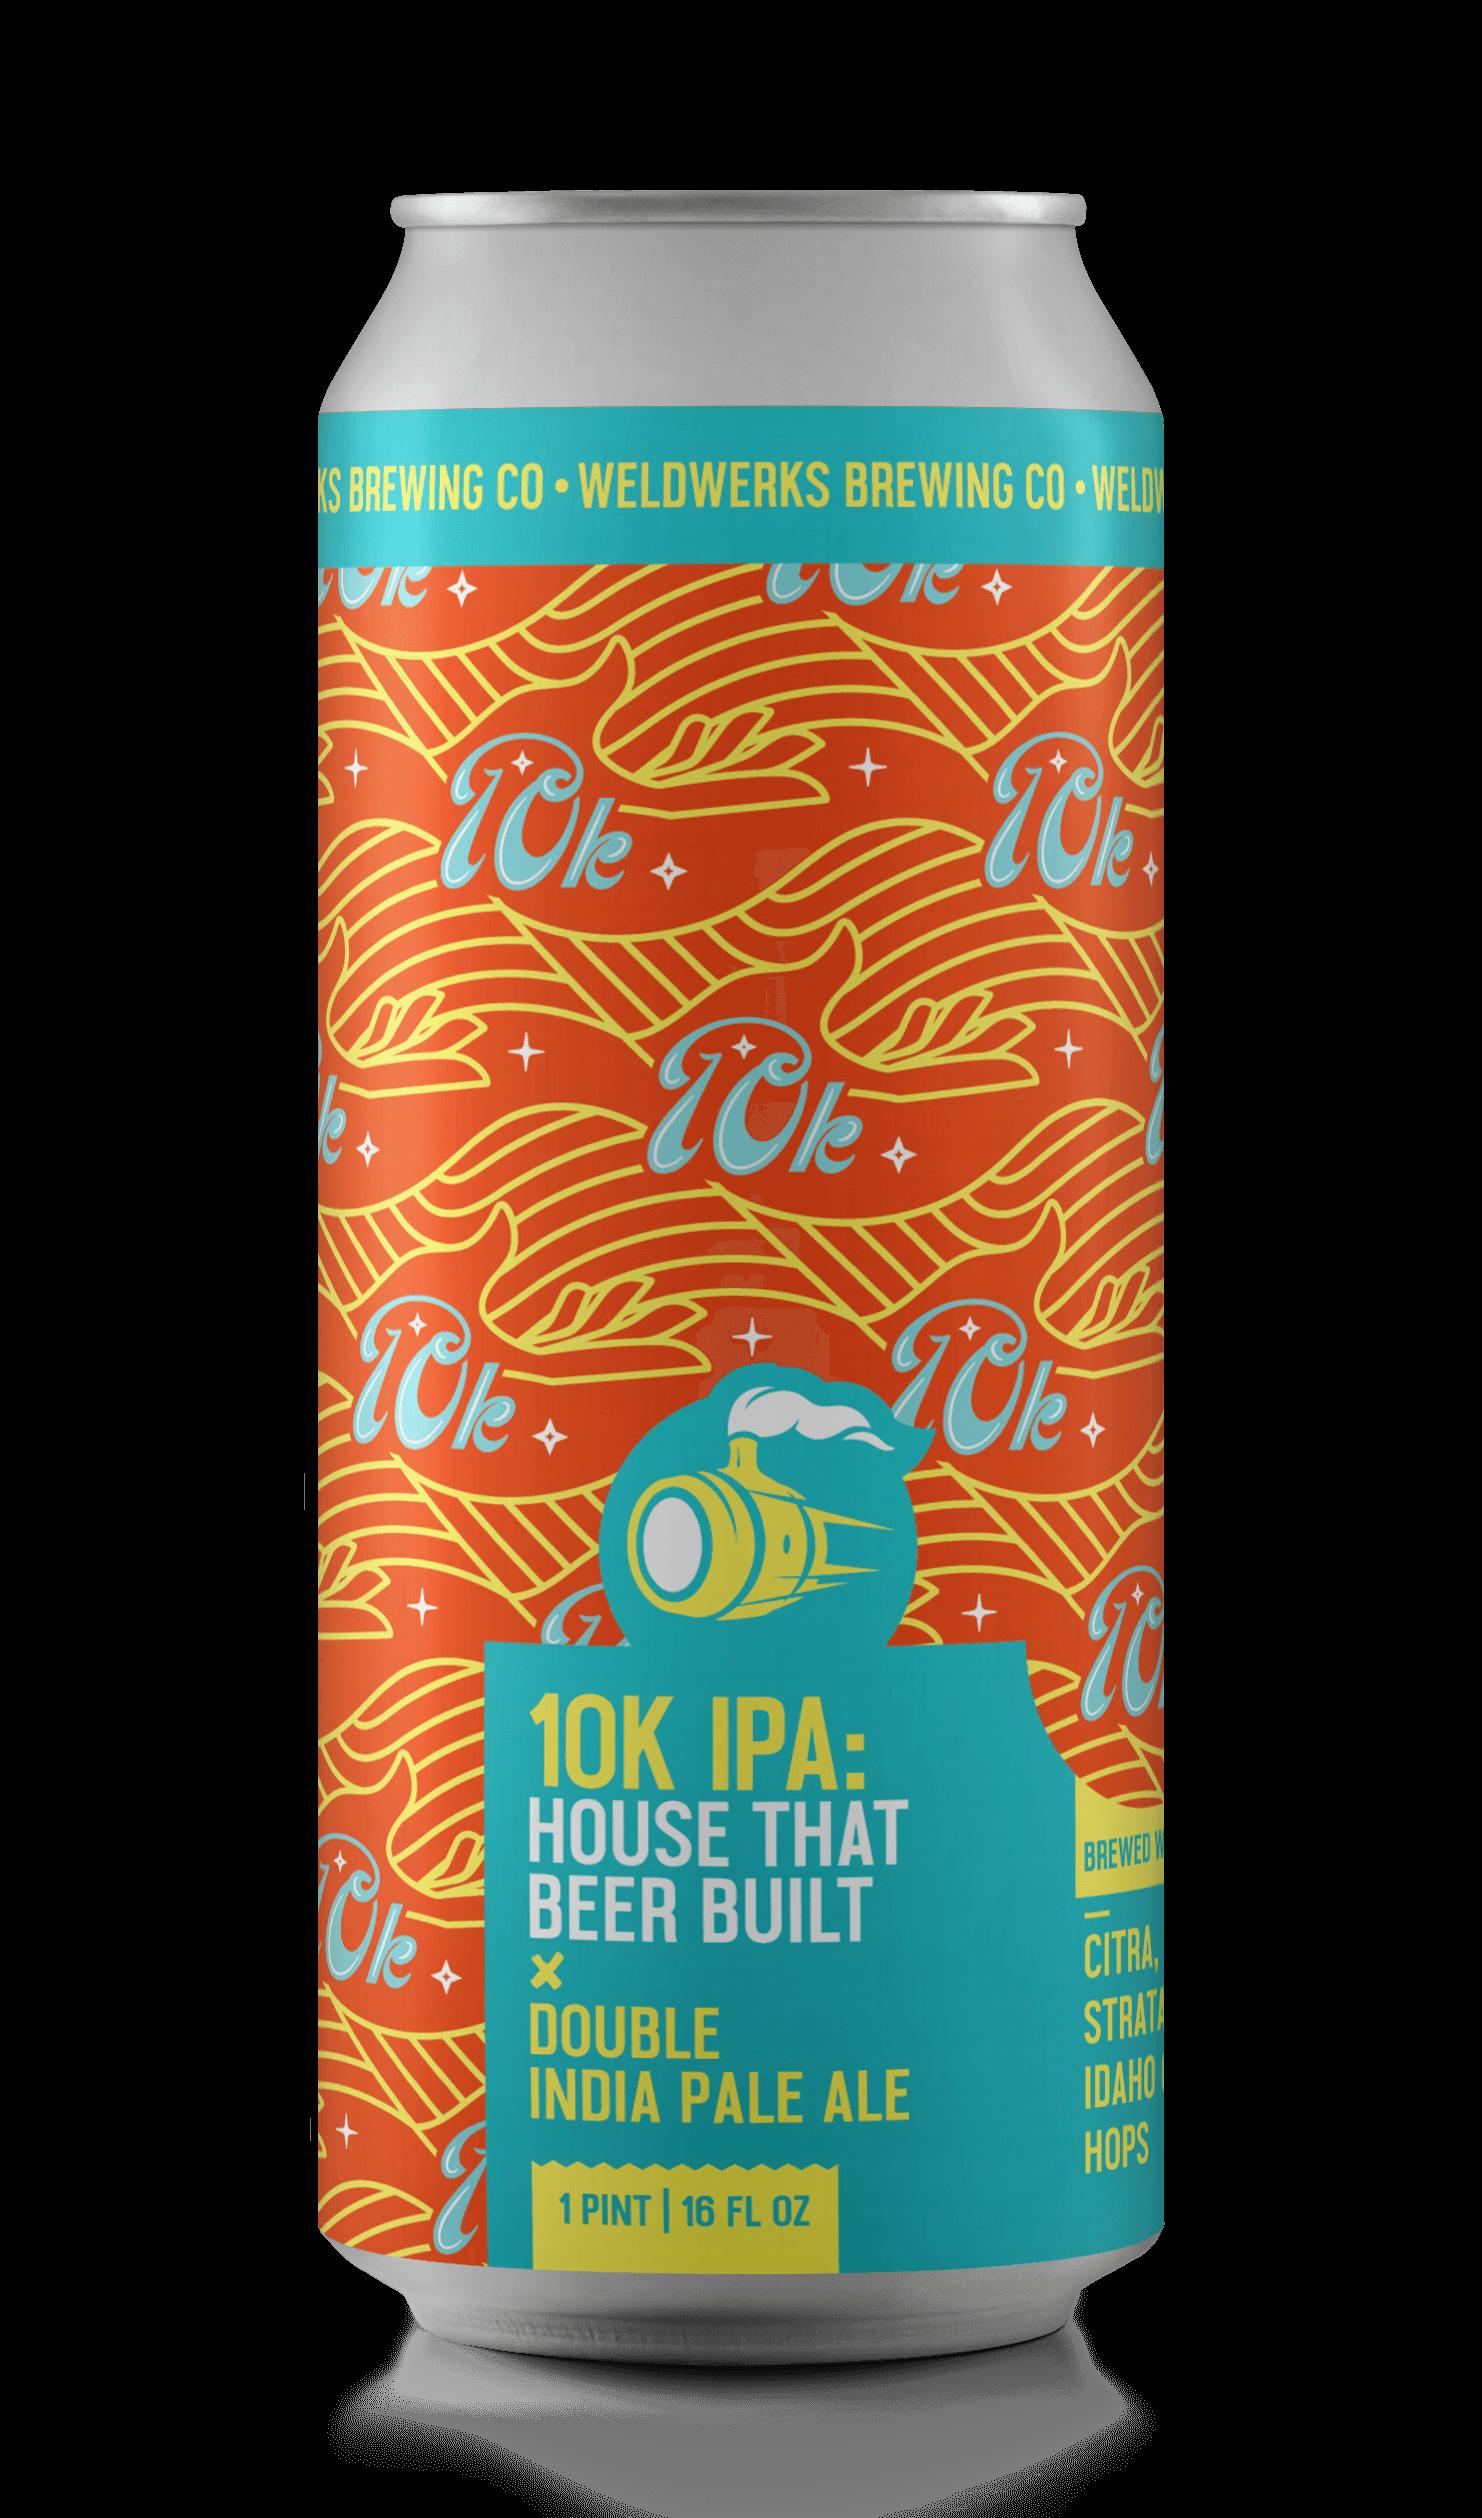 10K IPA: House that Beer Built